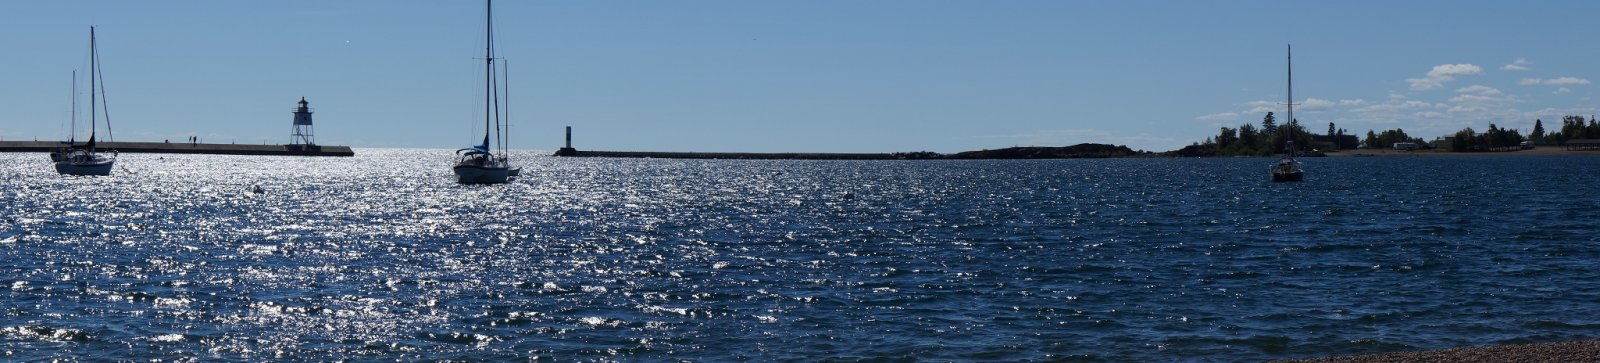 Click image for larger version  Name:Grand Marais harbor.jpg Views:63 Size:150.7 KB ID:168599